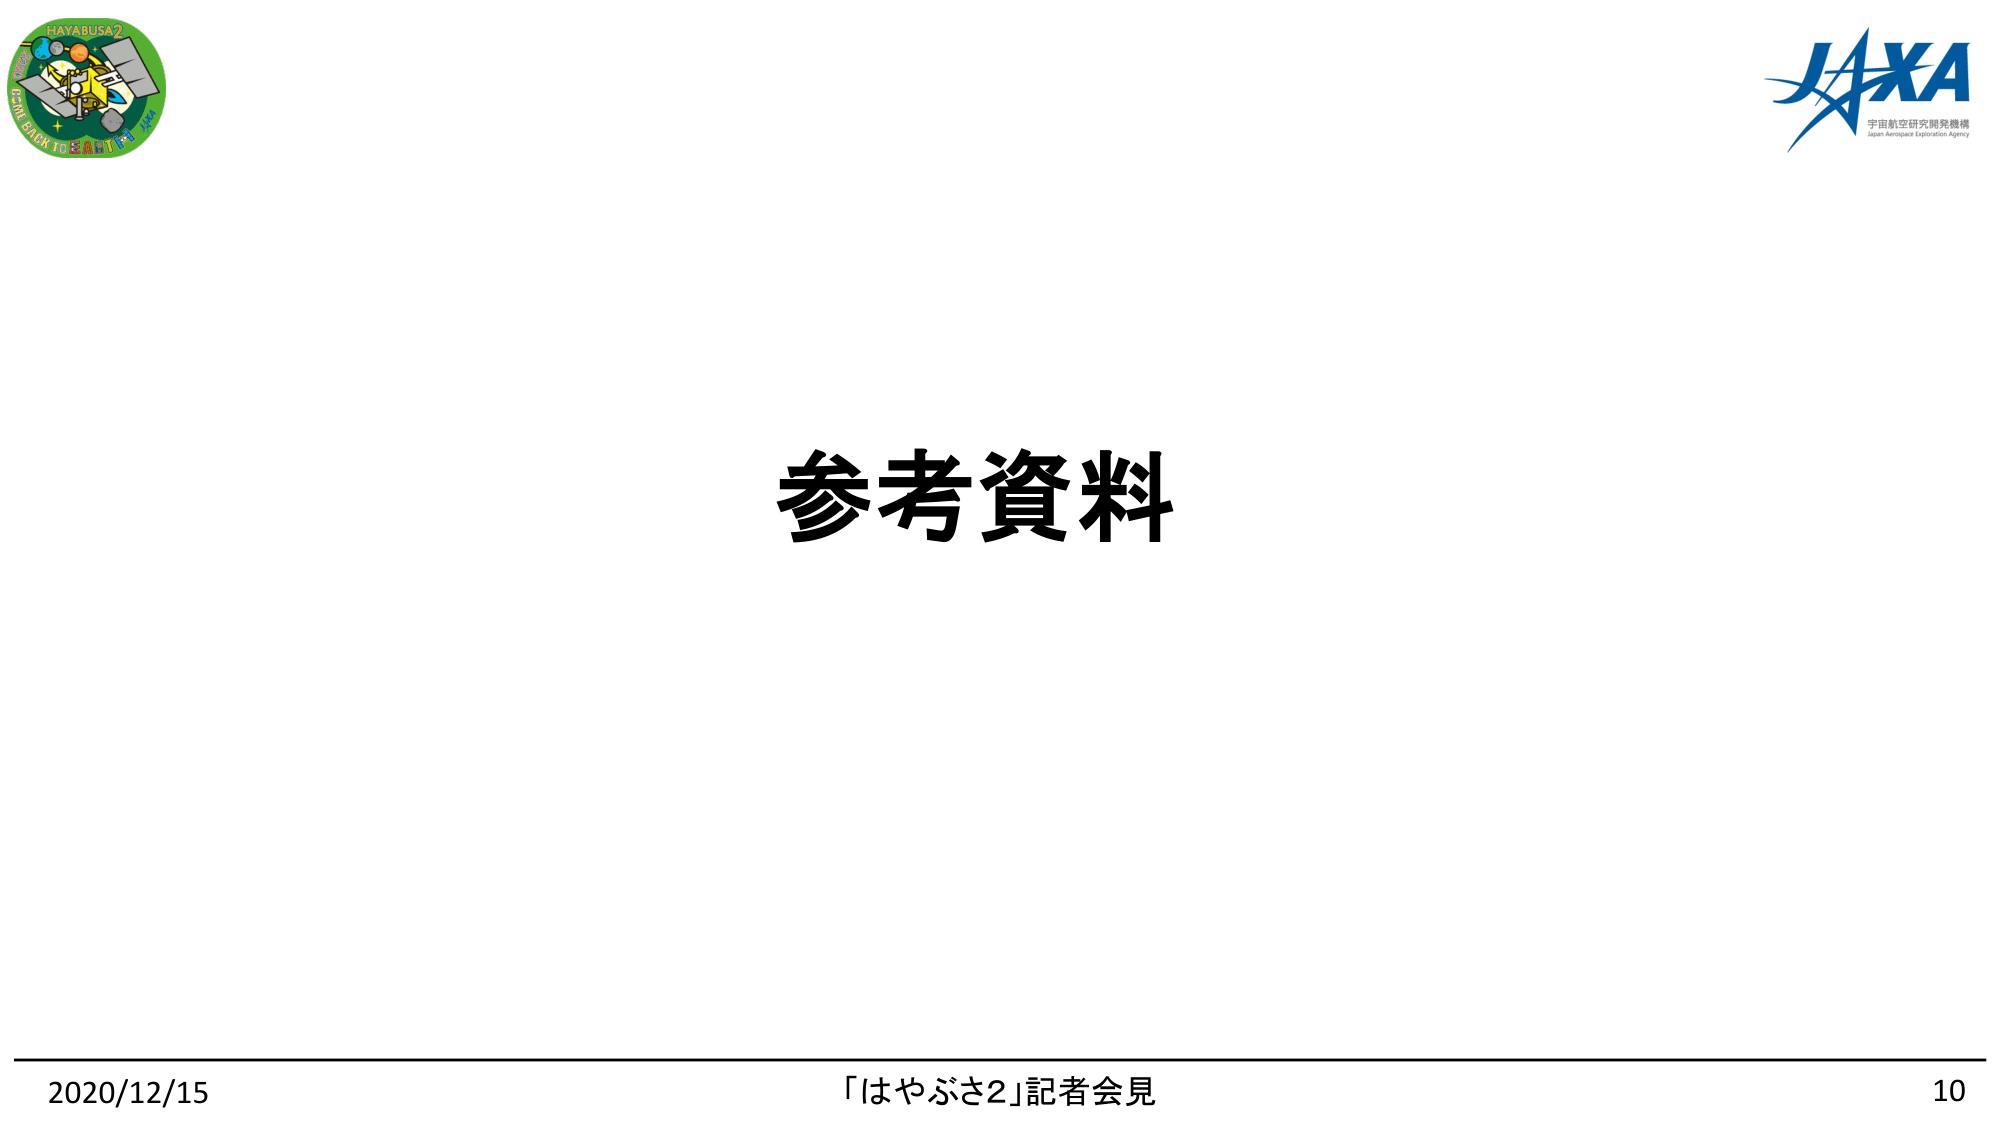 f:id:Imamura:20201215132112p:plain